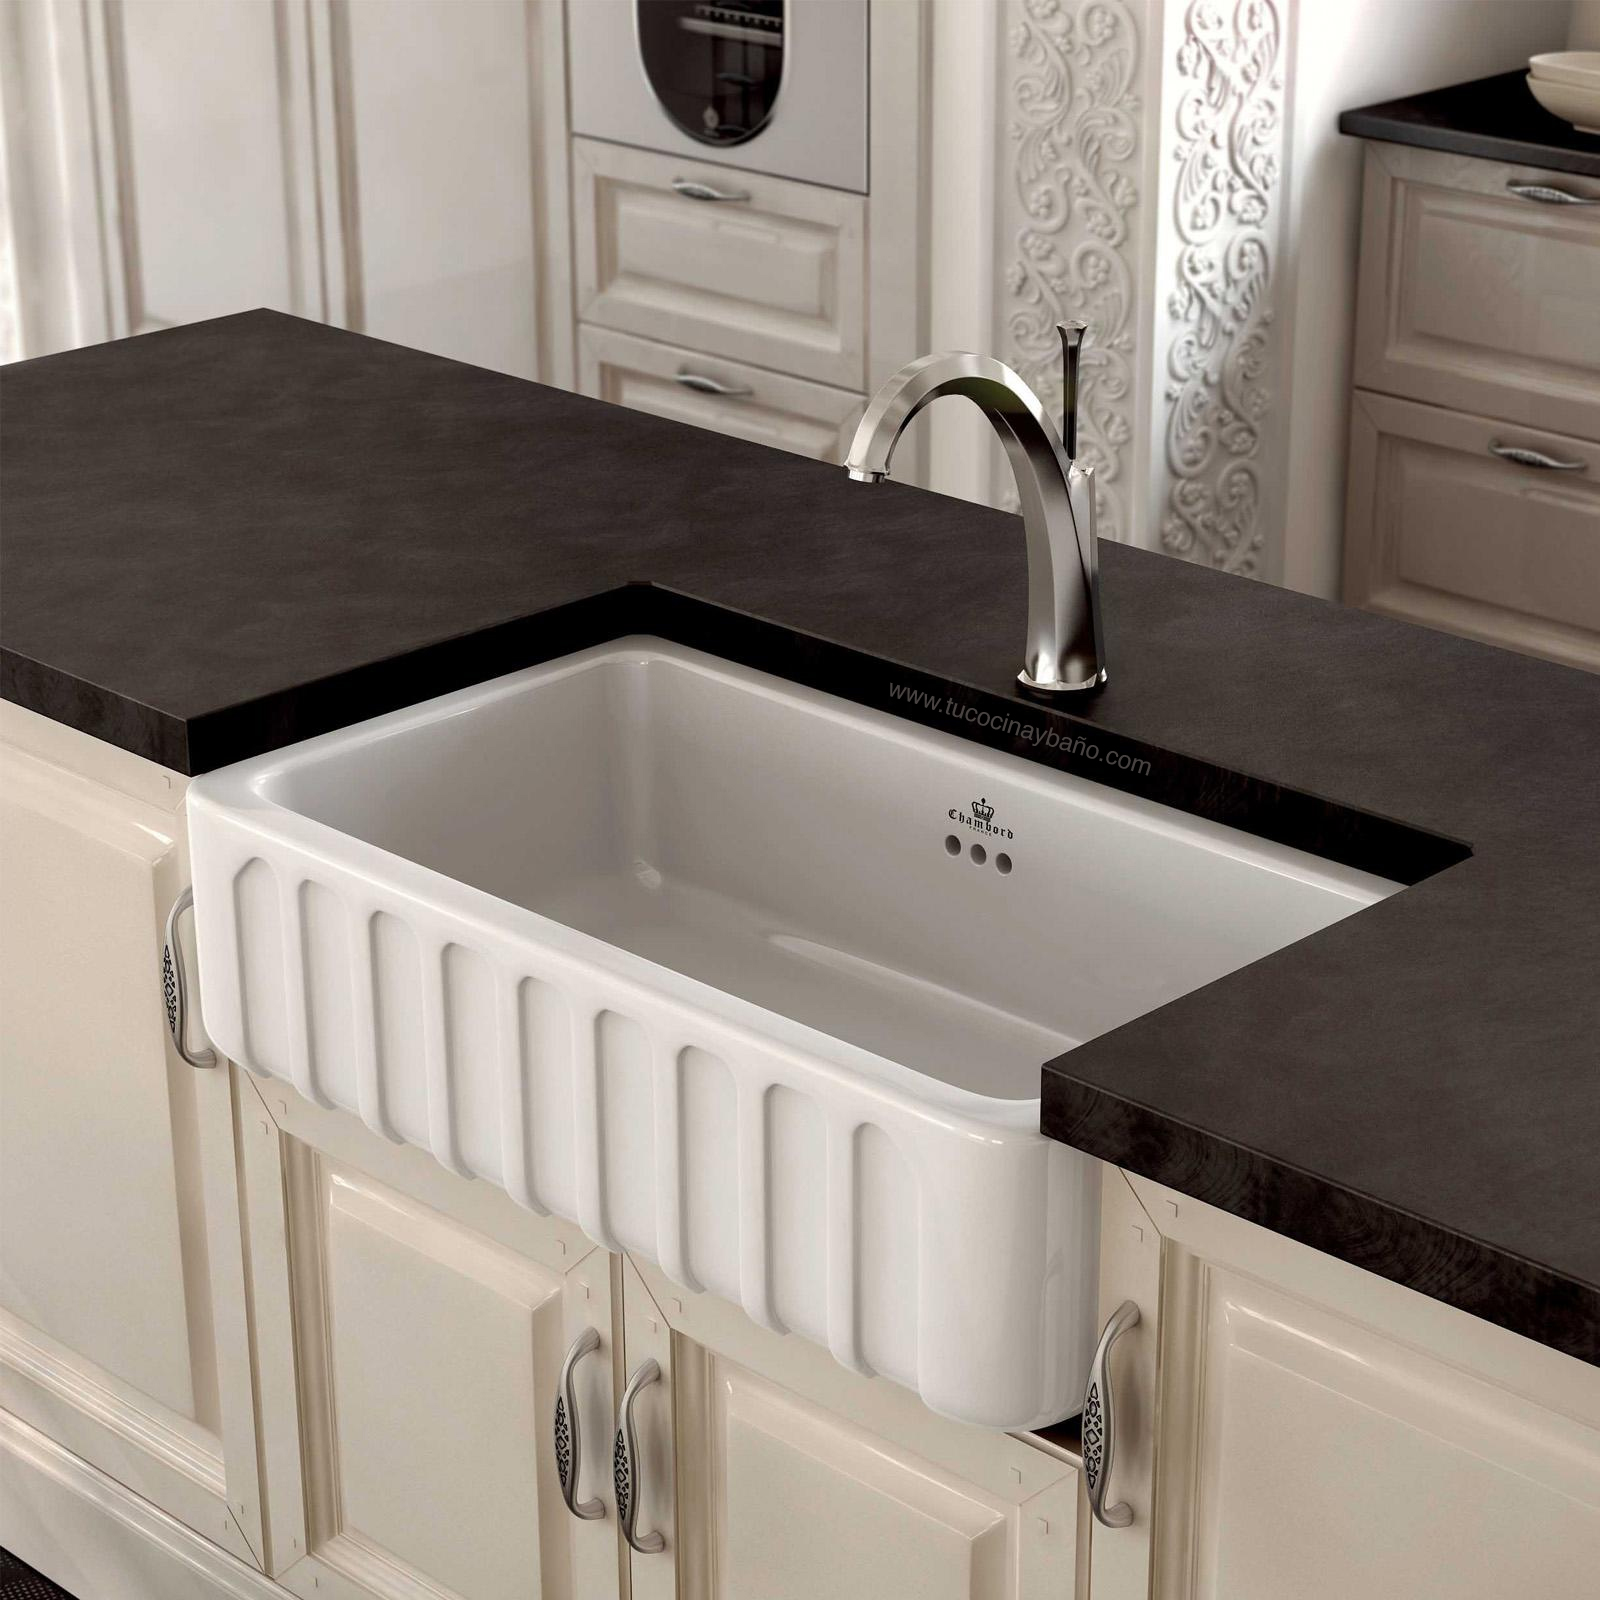 Fregadero ceramico luis segundo tu cocina y ba o - Fregaderos de cocina precios ...